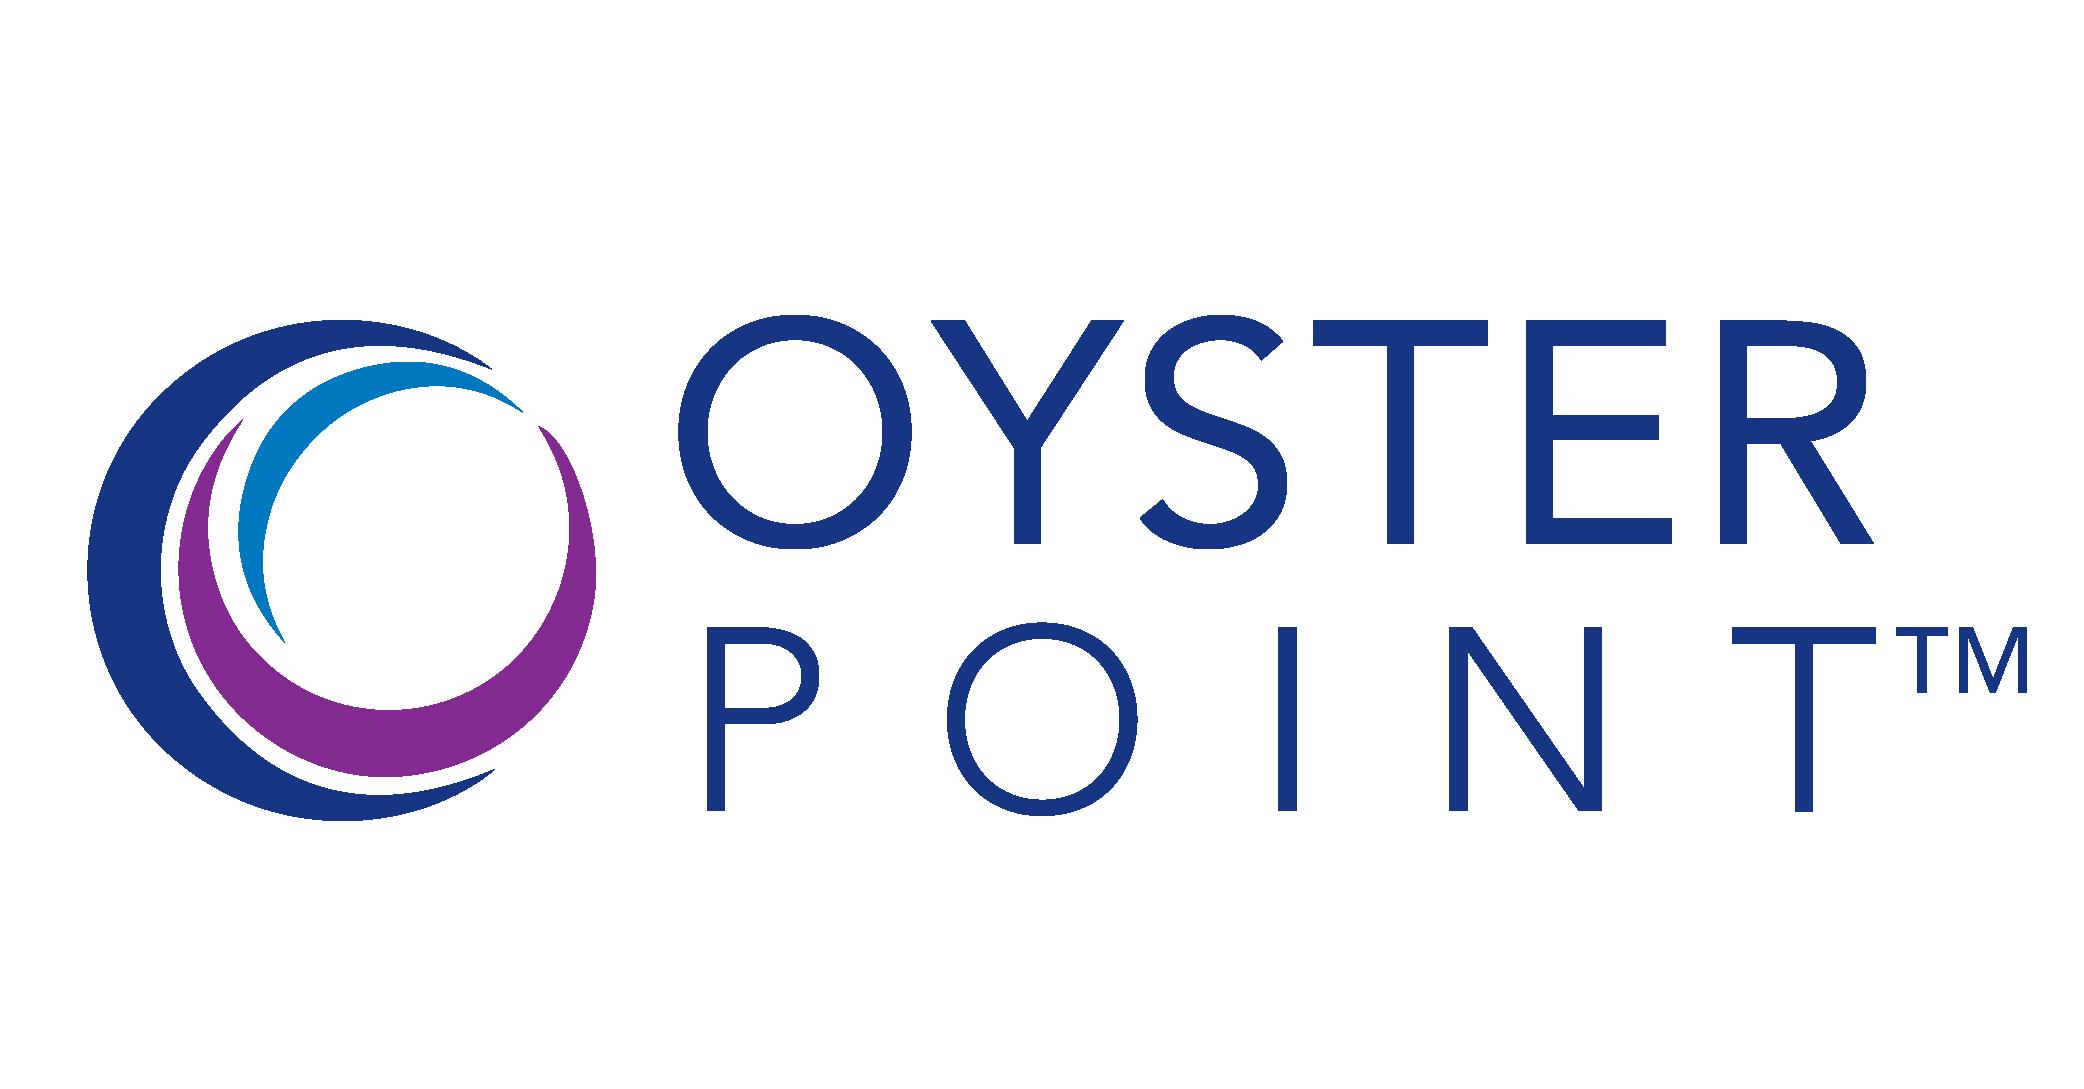 https://cdn.kscope.io/bfe3ee4db3767aef9855eaa90c8751be-oyster_pointxlogoxtmxrgba.jpg